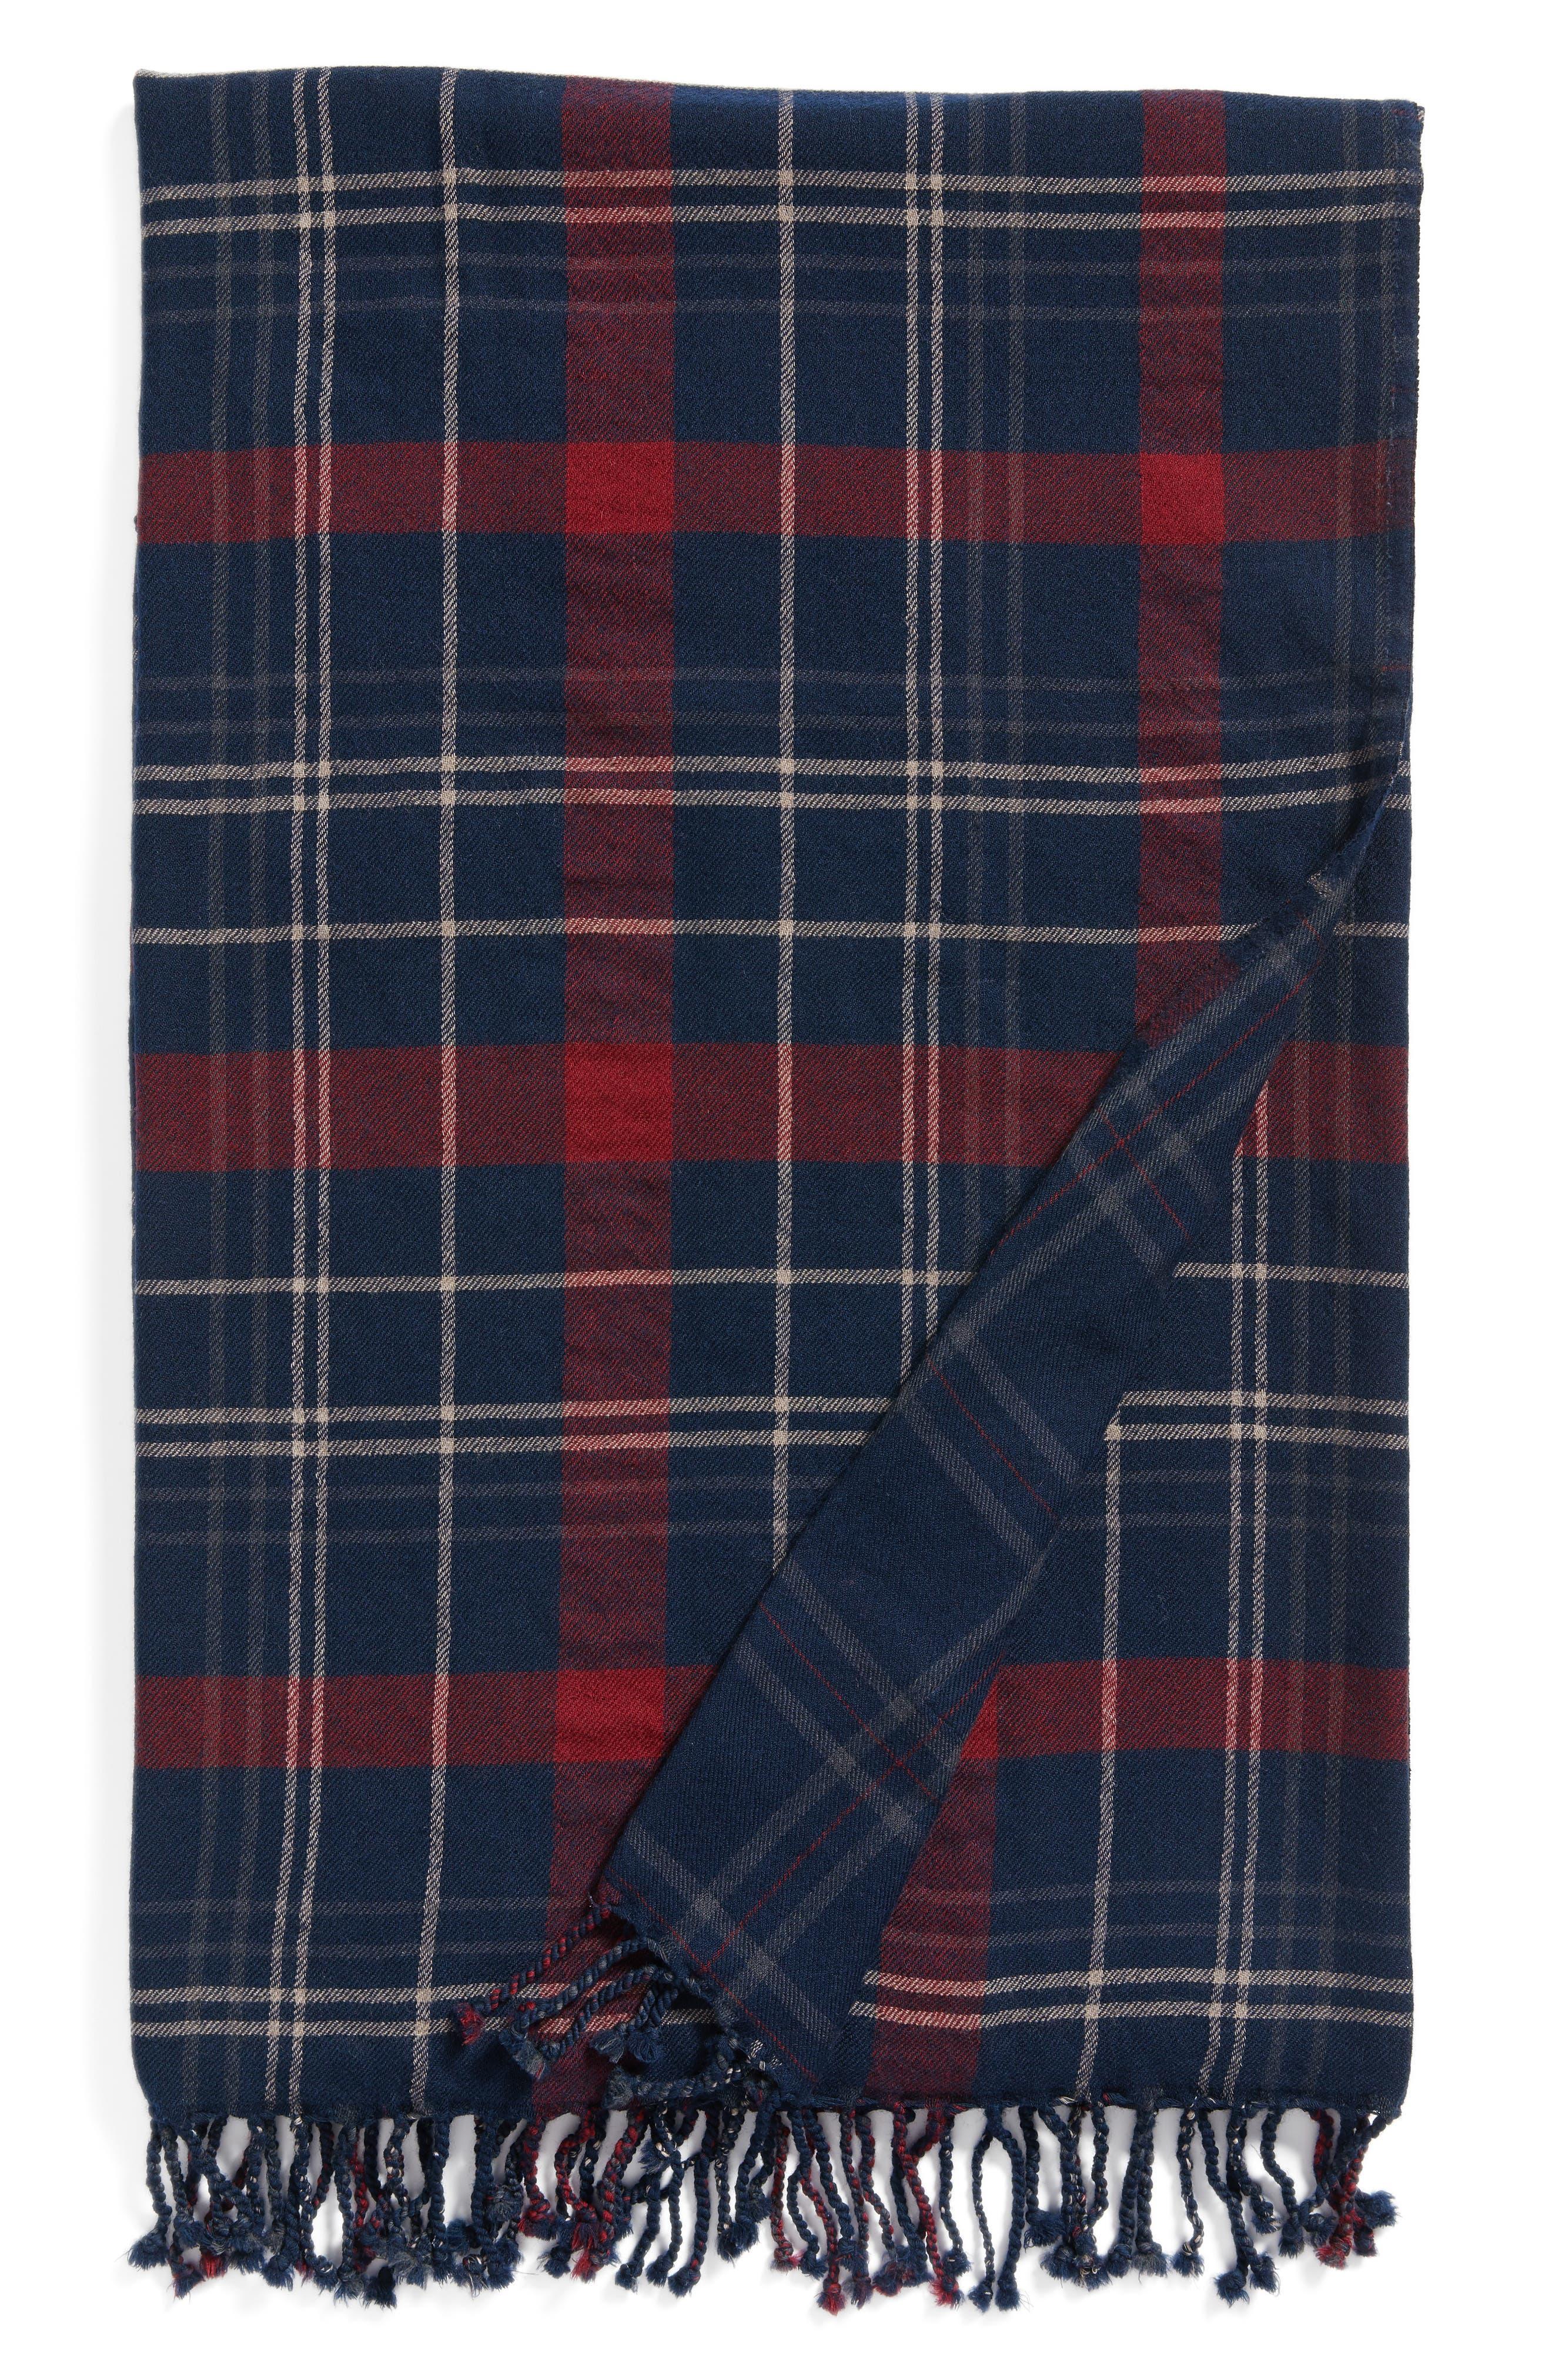 Alternate Image 1 Selected - Modern Staples Tartan Double Face Merino Wool Throw